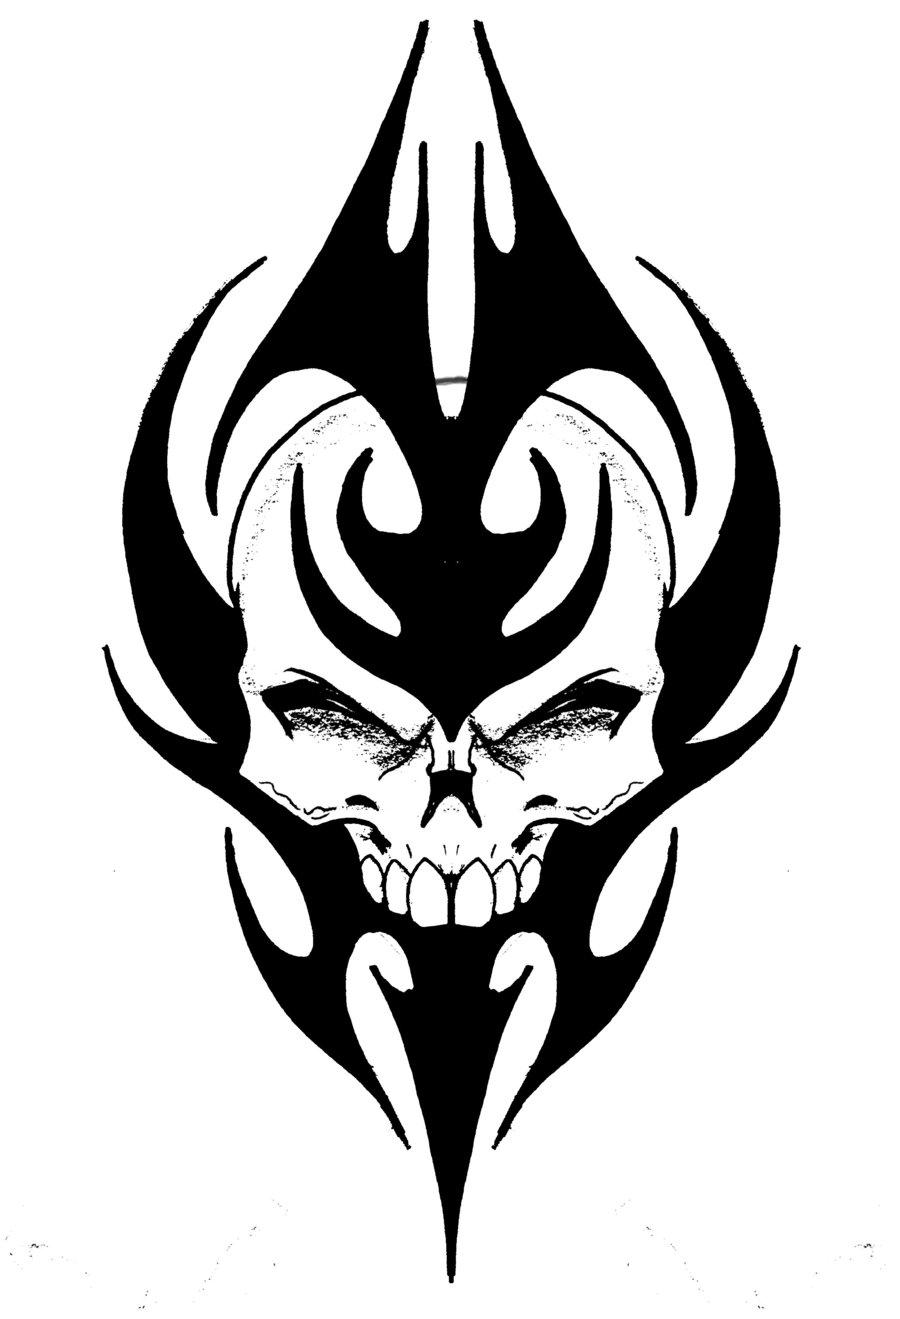 Drawn ssckull tribal Skull biomek biomek on Tribal